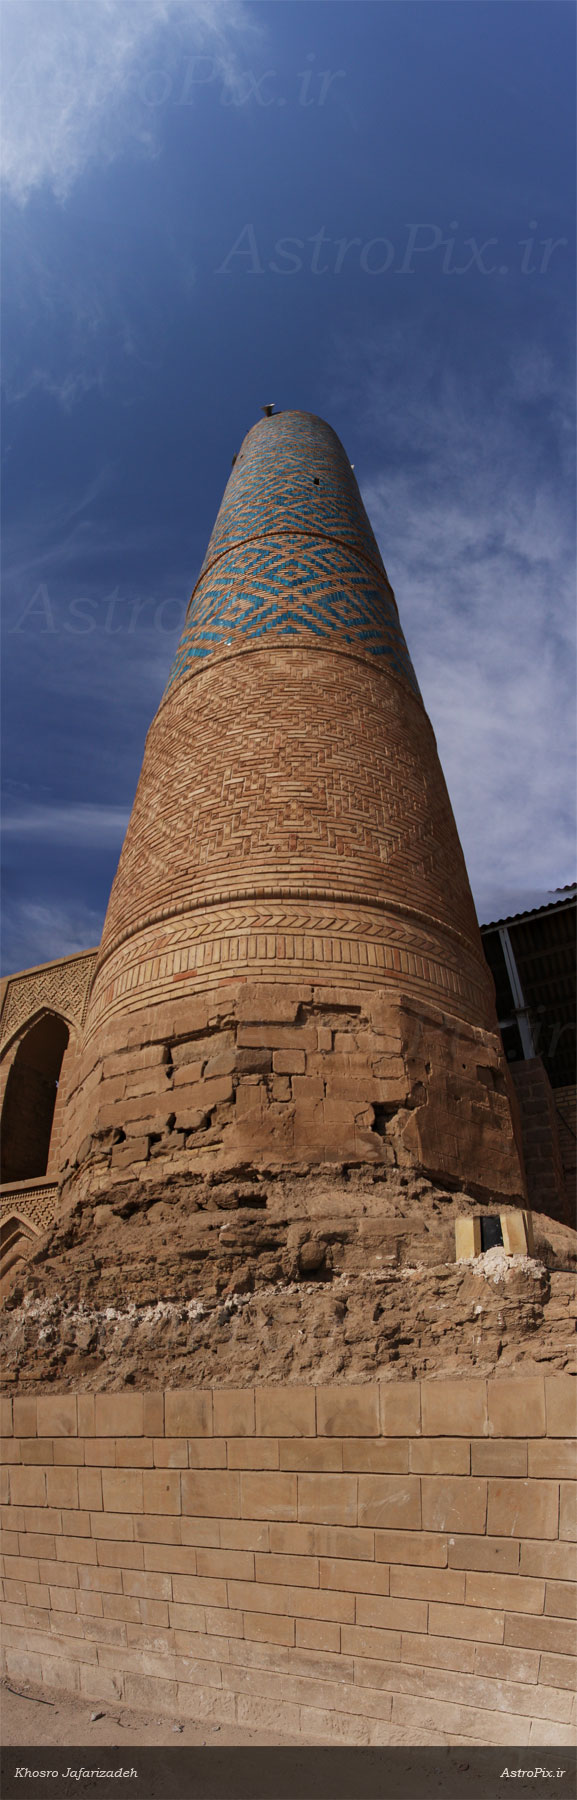 Mosque_Jamee_Shushtar_07